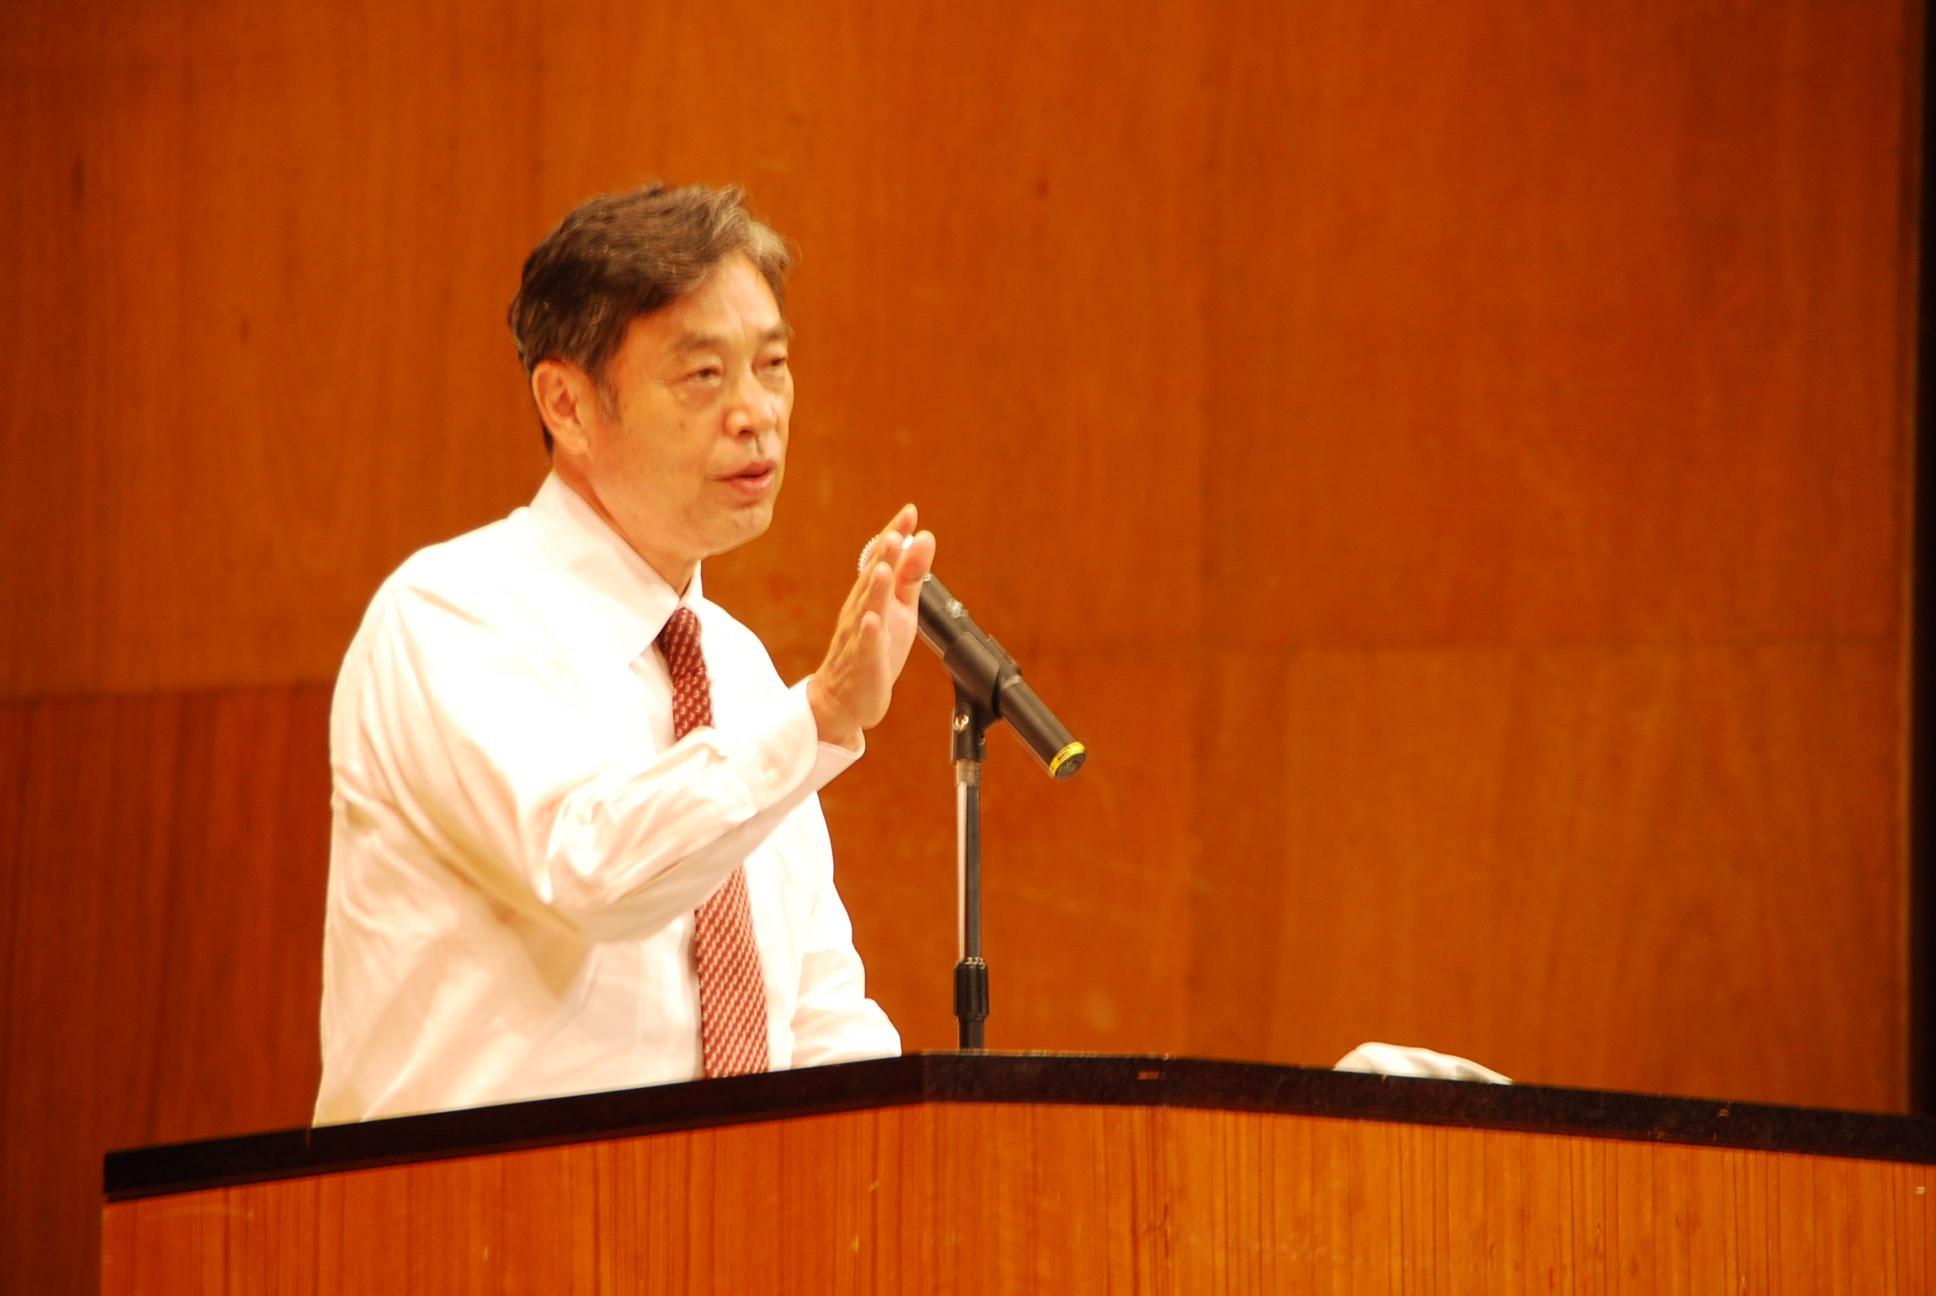 岩手県陸前高田市で講演会